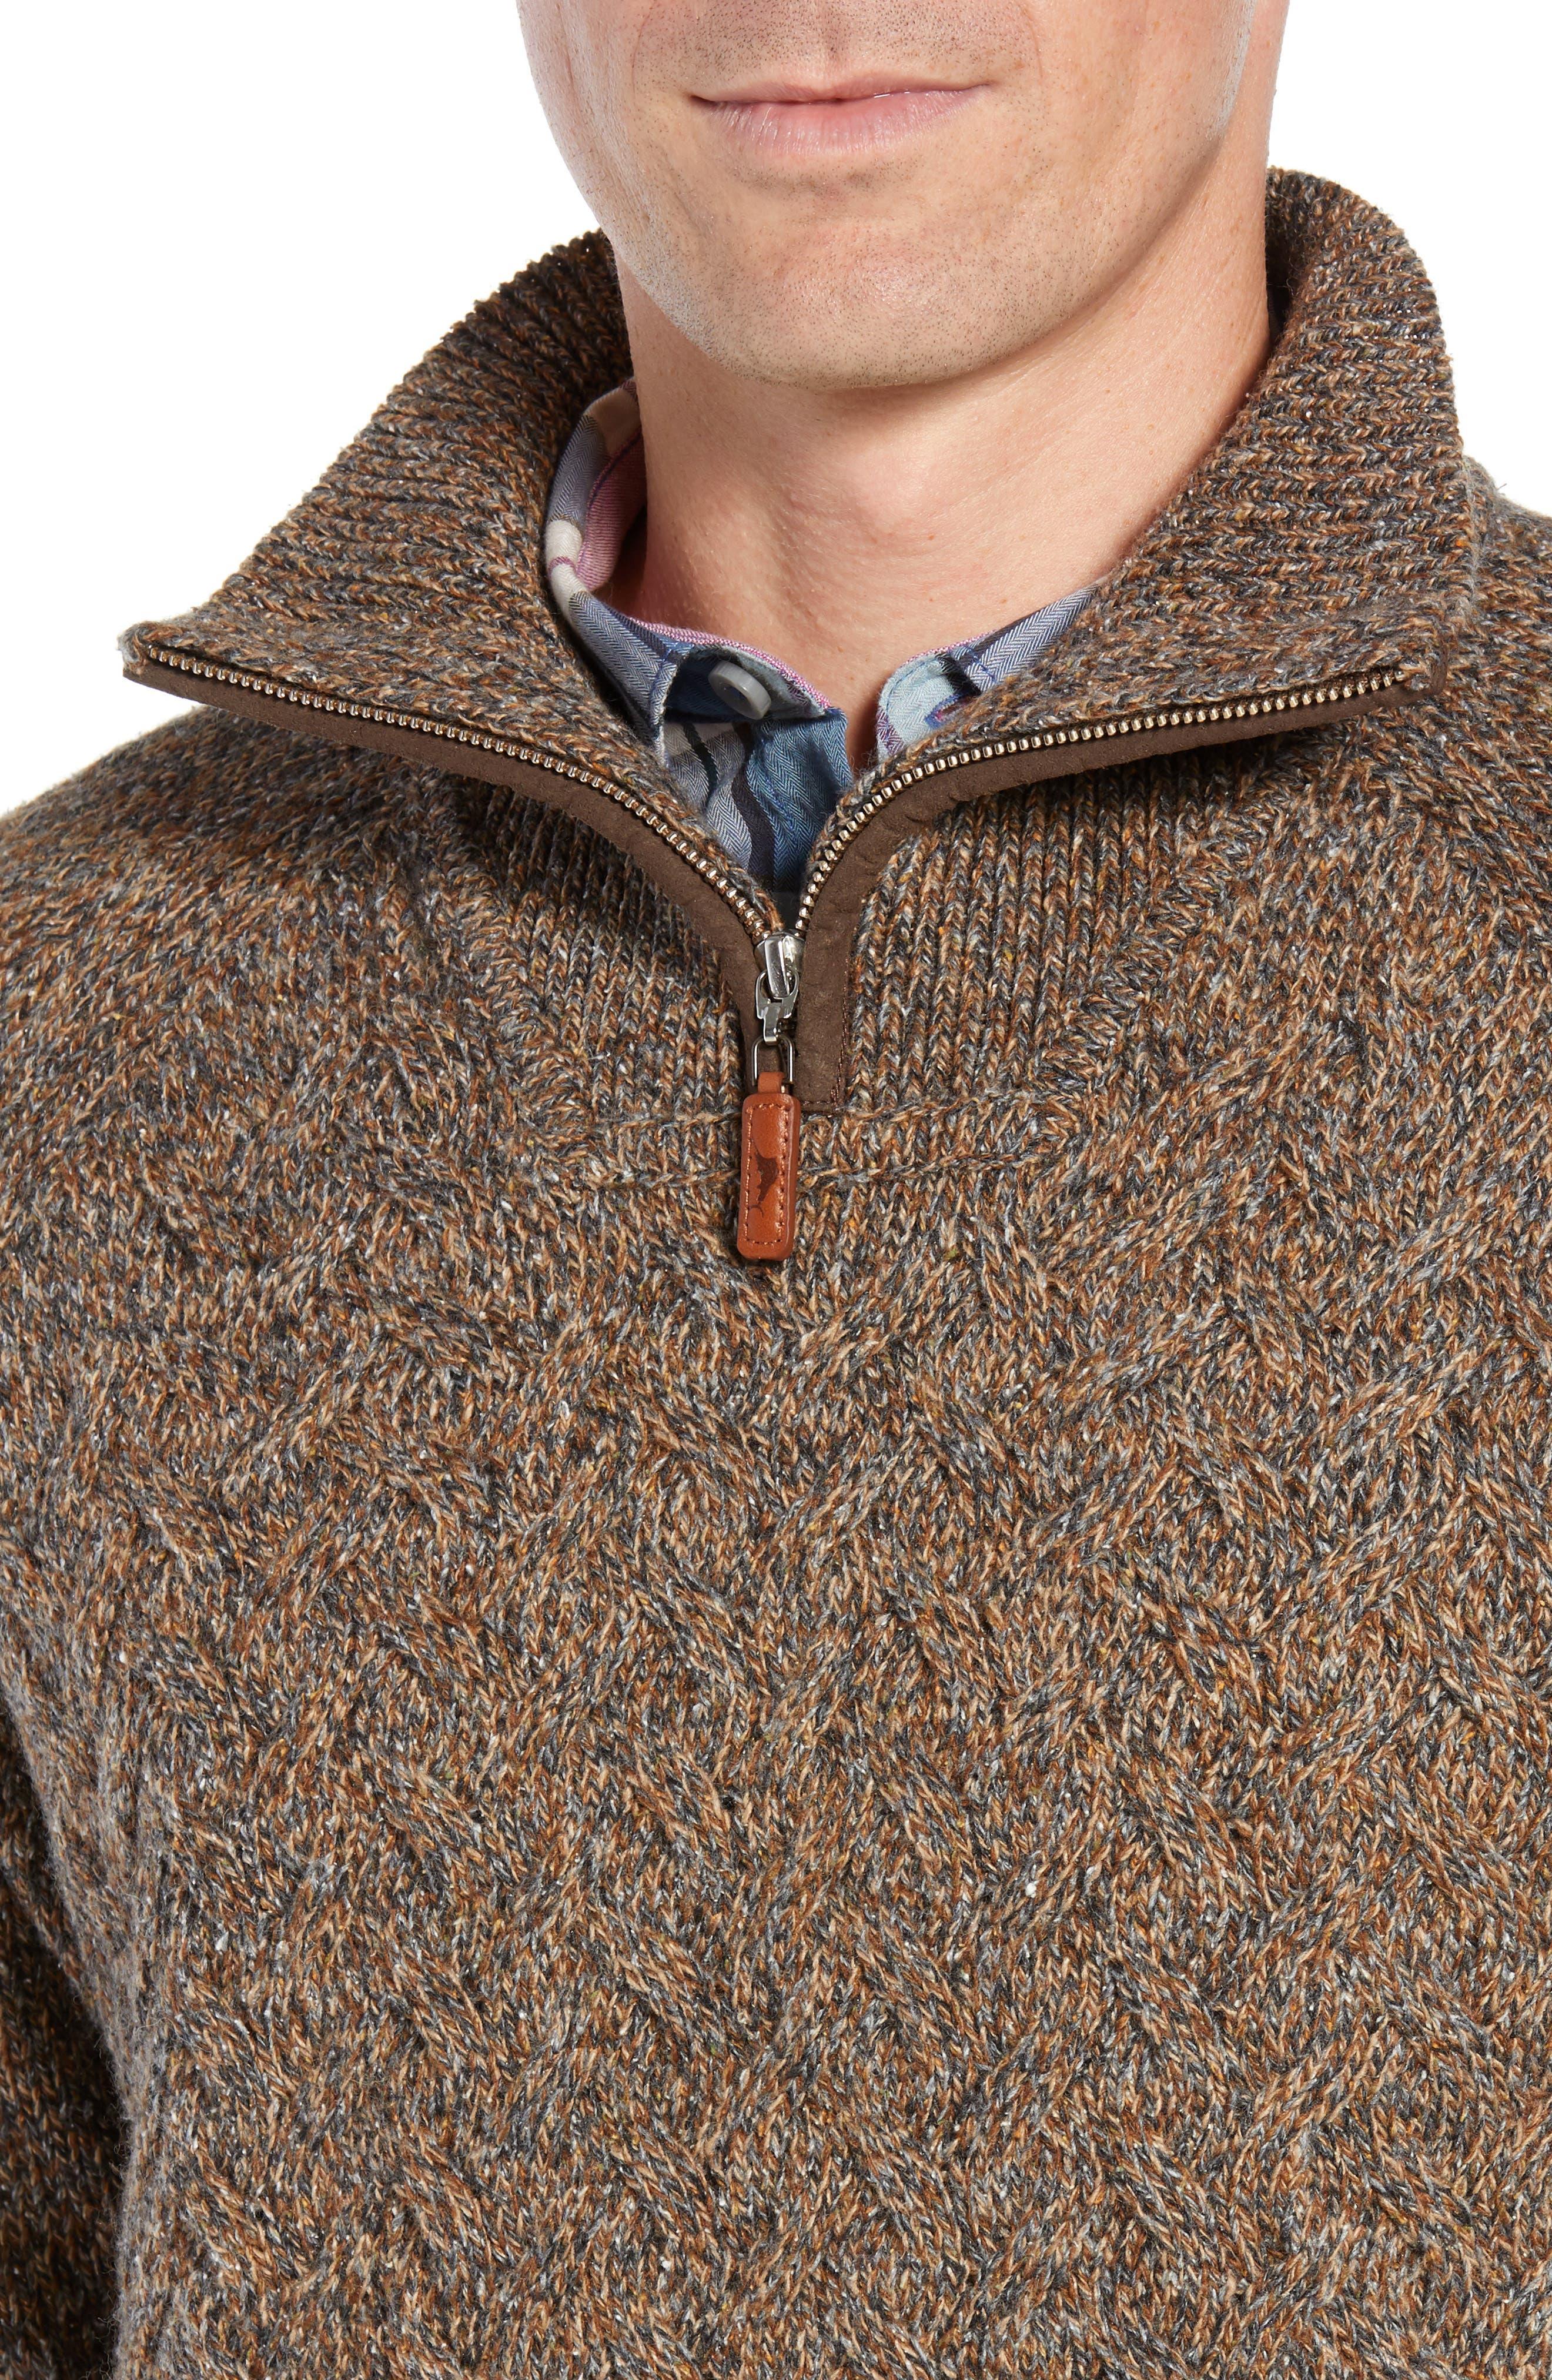 Irazu Half Zip Sweater,                             Alternate thumbnail 4, color,                             201